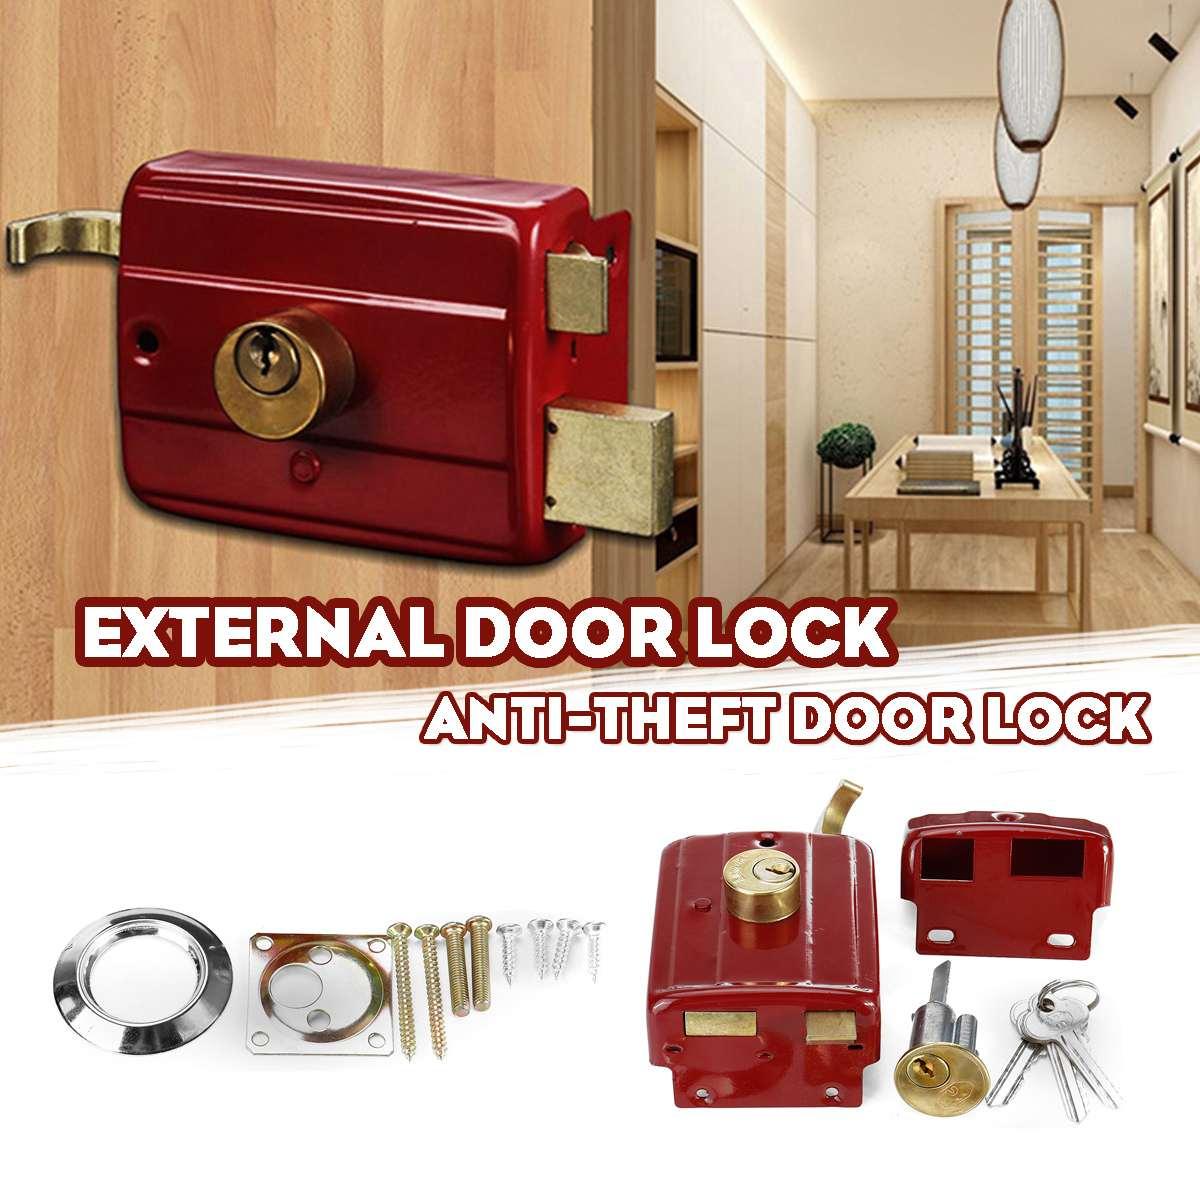 cast-iron-anti-theft-exterior-door-retro-red-locks-multiple-insurance-lock-wooden-door-lock-security